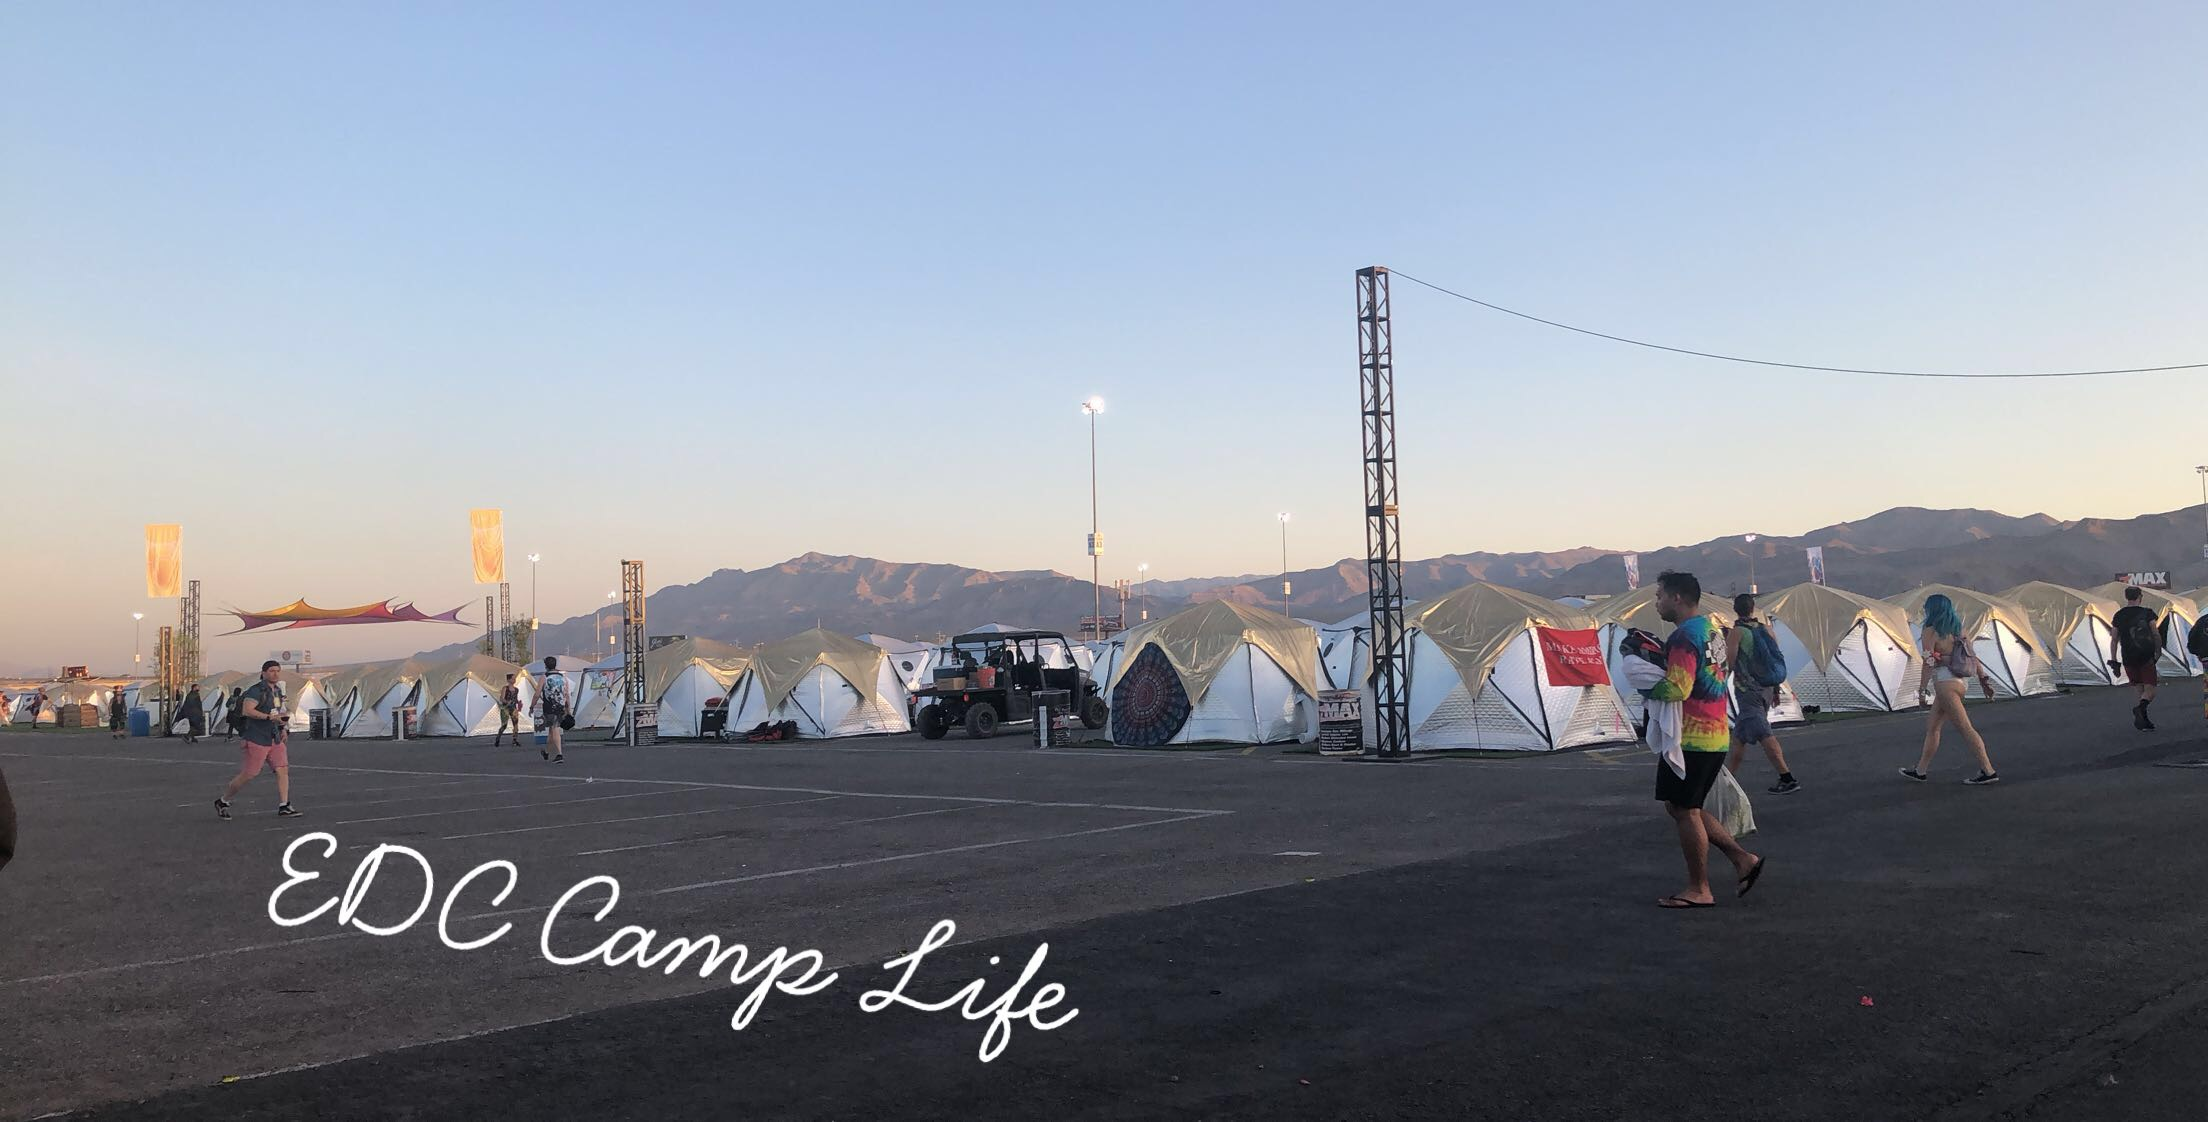 Camp EDC